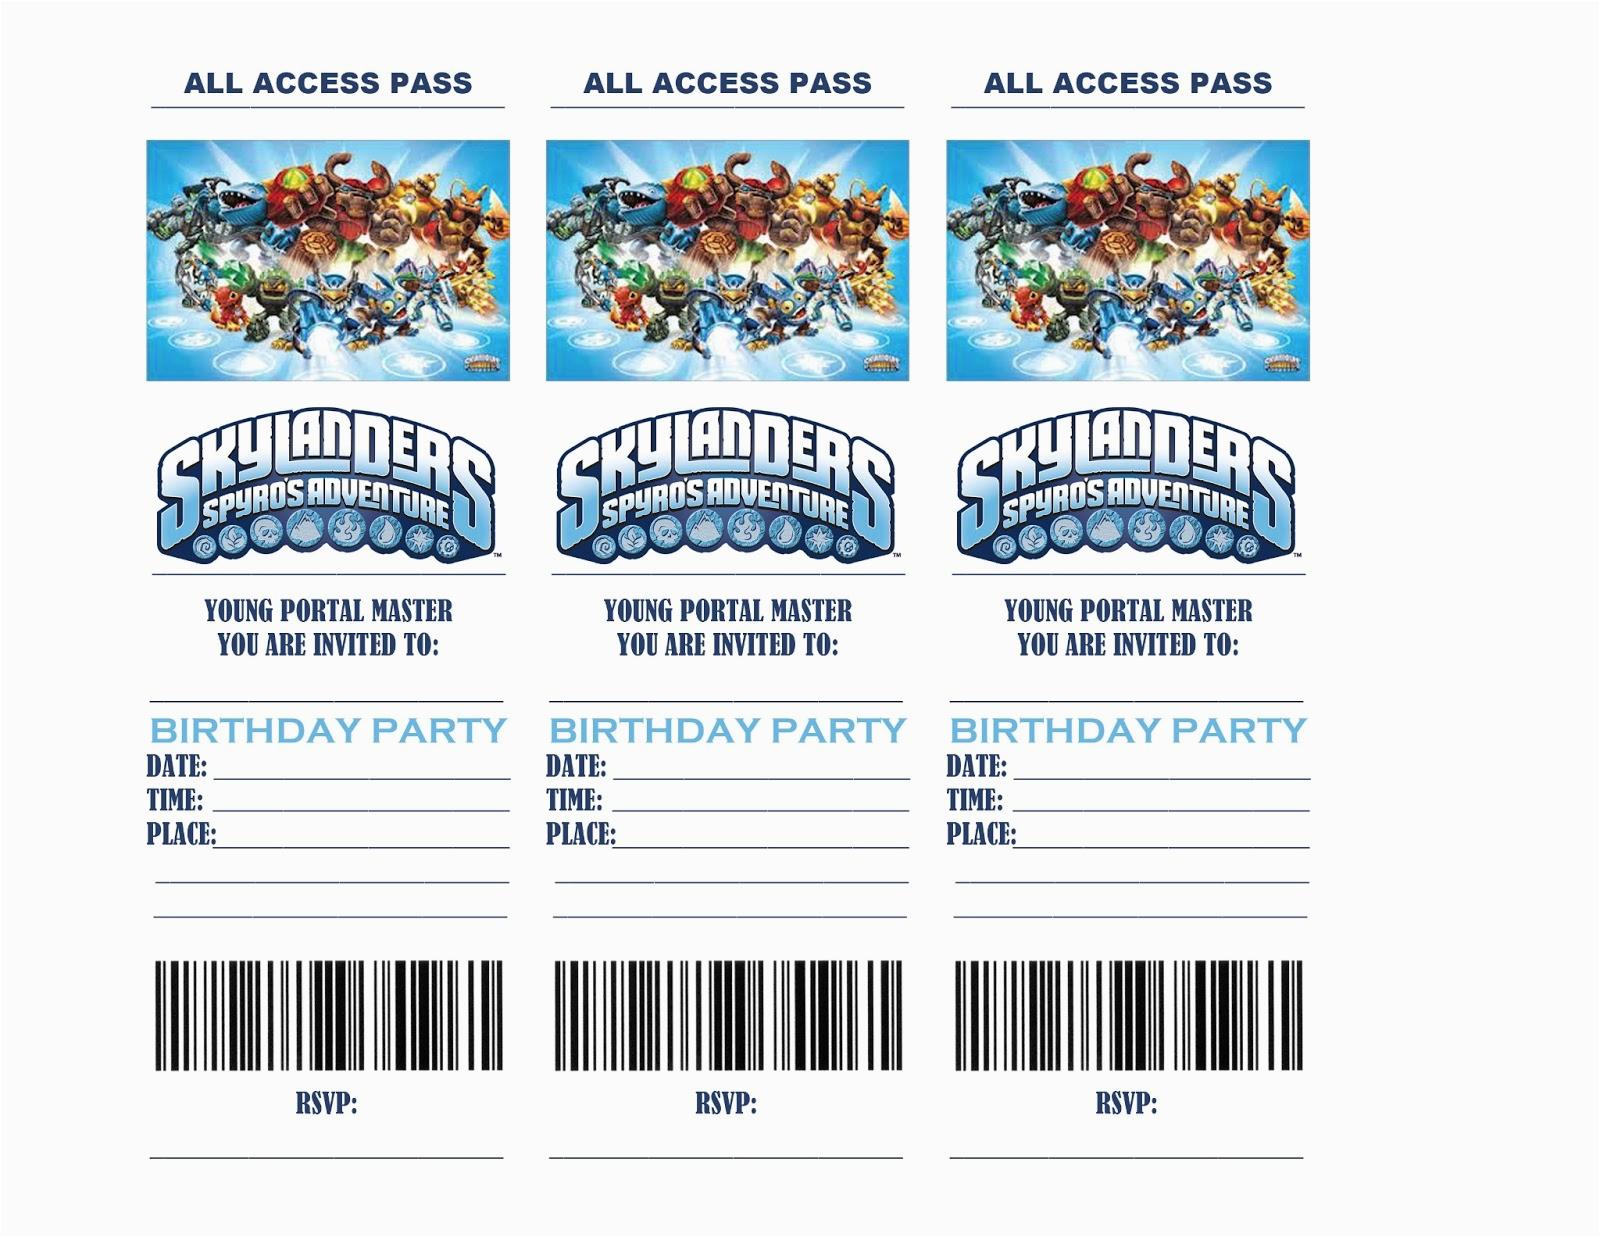 Free Printable Skylanders Birthday Invitations   Birthdaybuzz - Free Printable Skylander Invitations